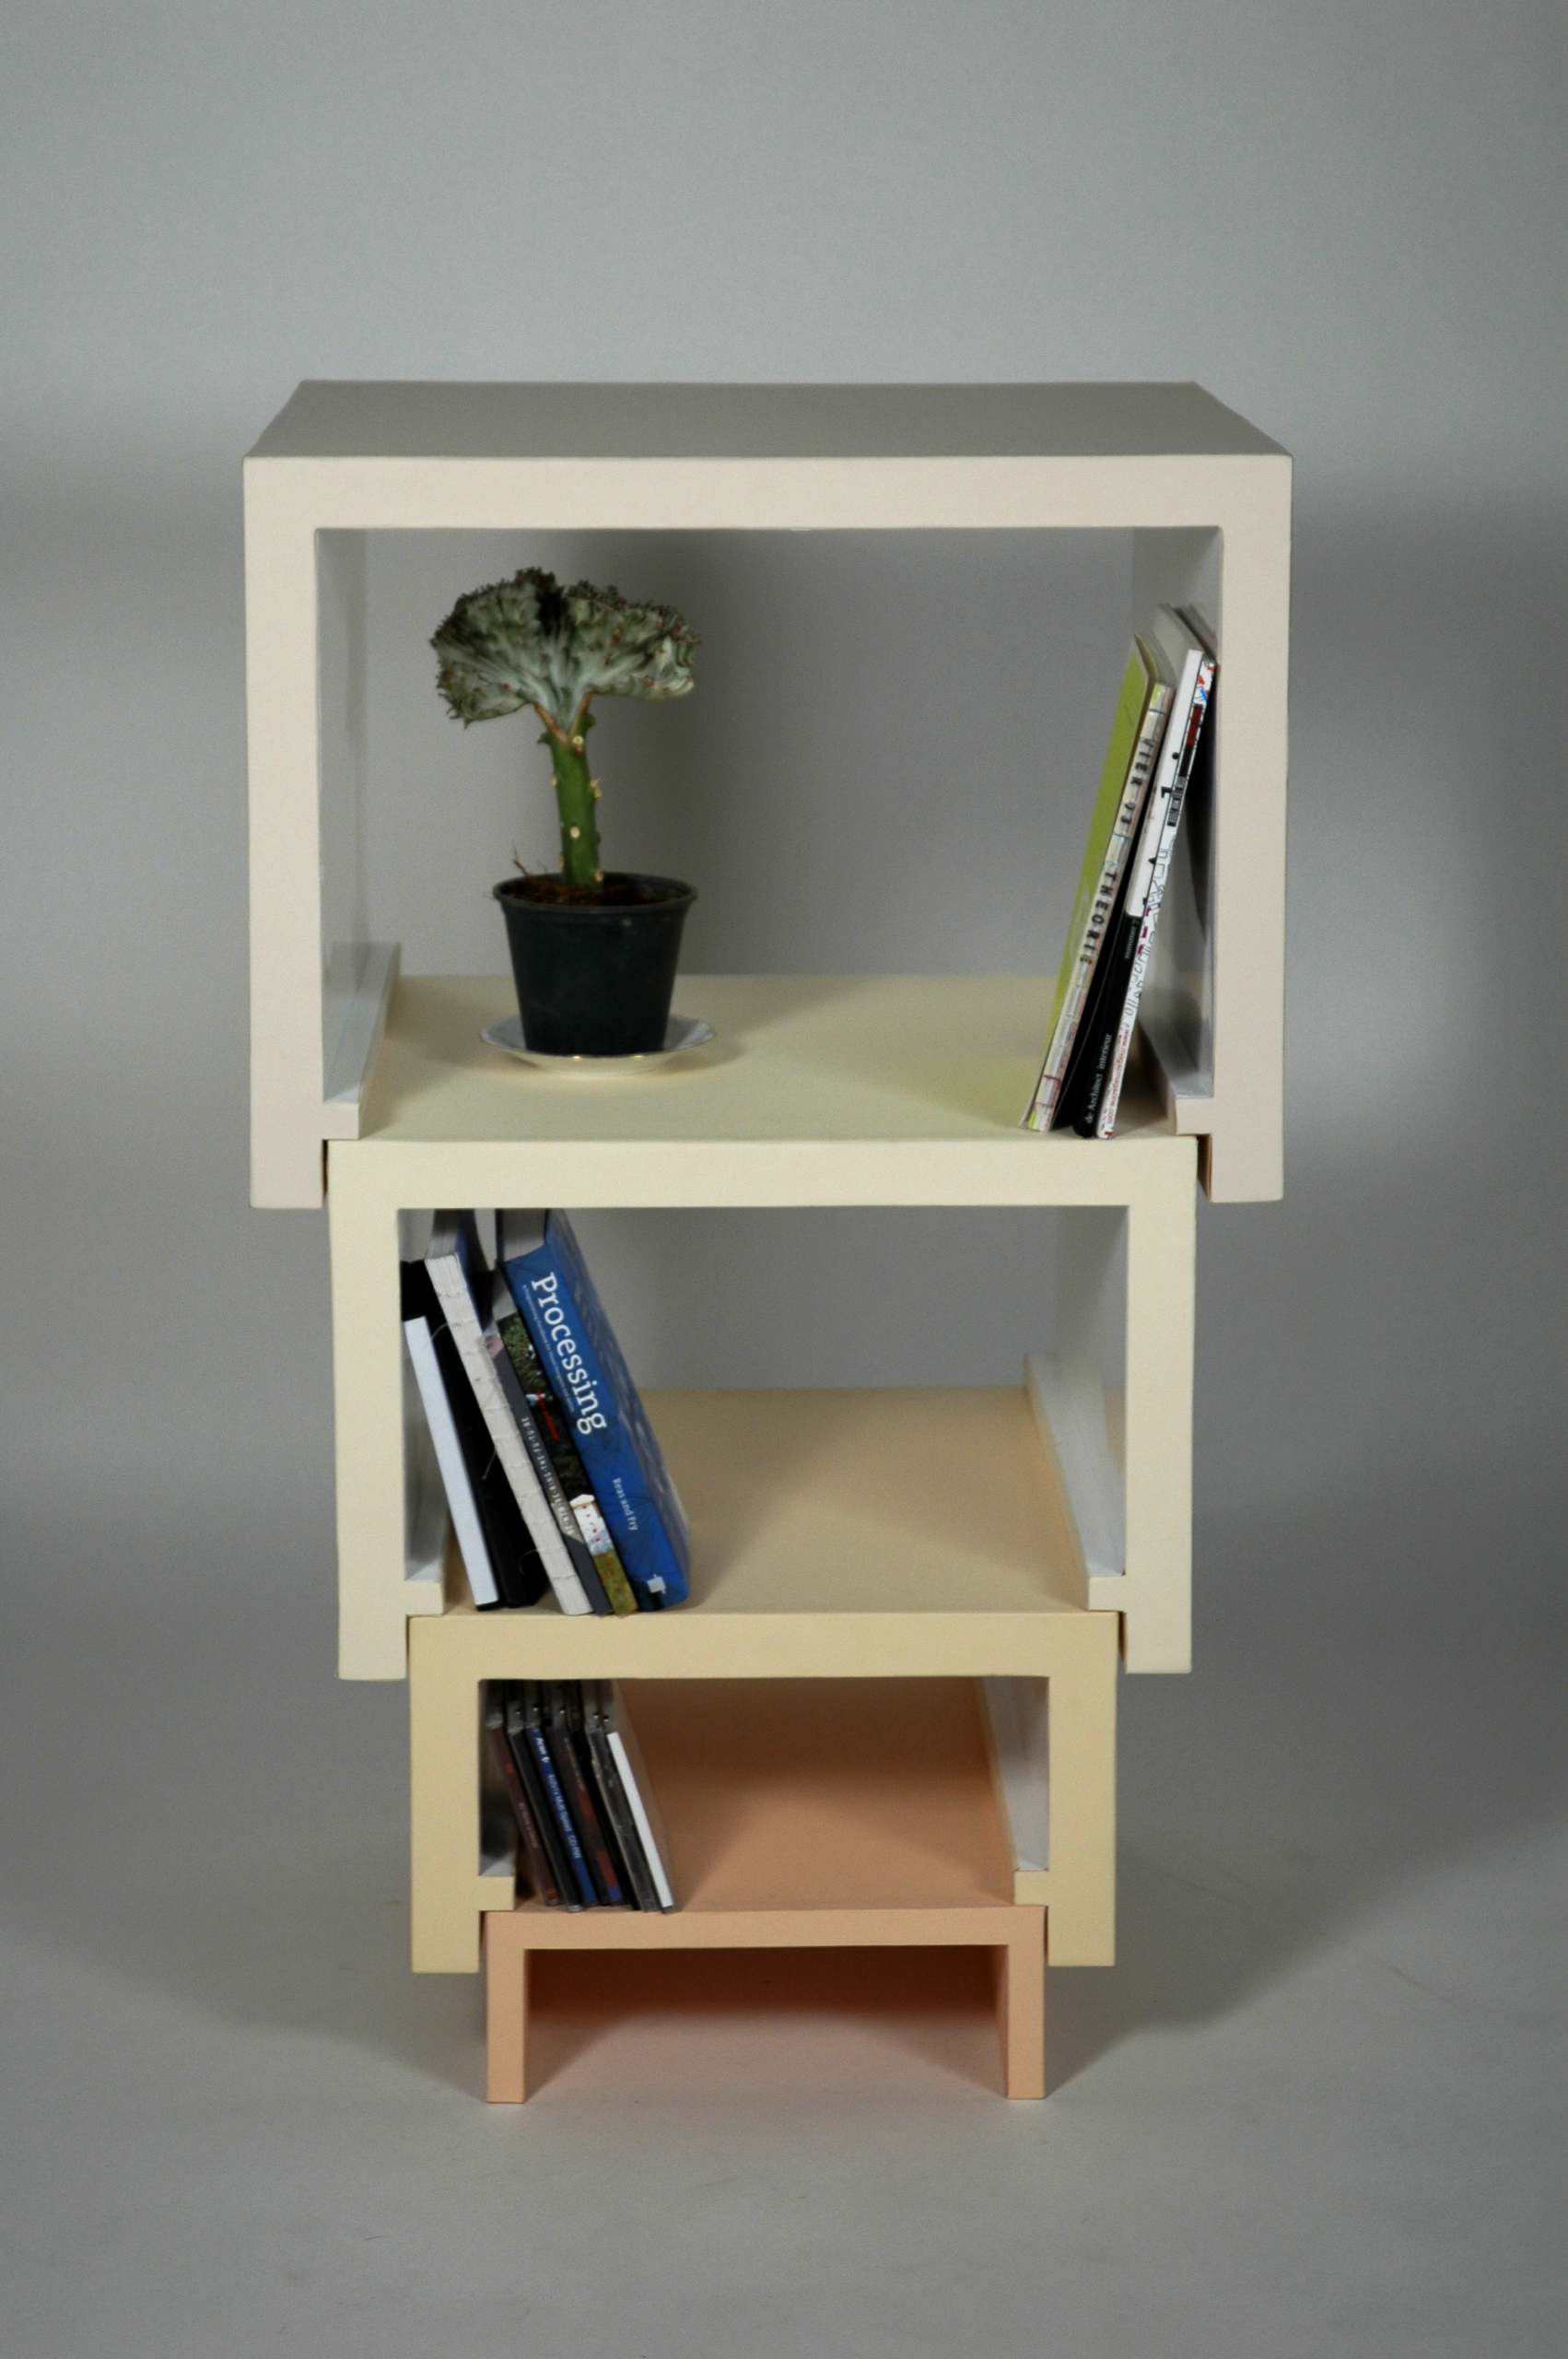 creative furniture ideas. dsc_3645_2 creative furniture ideas s